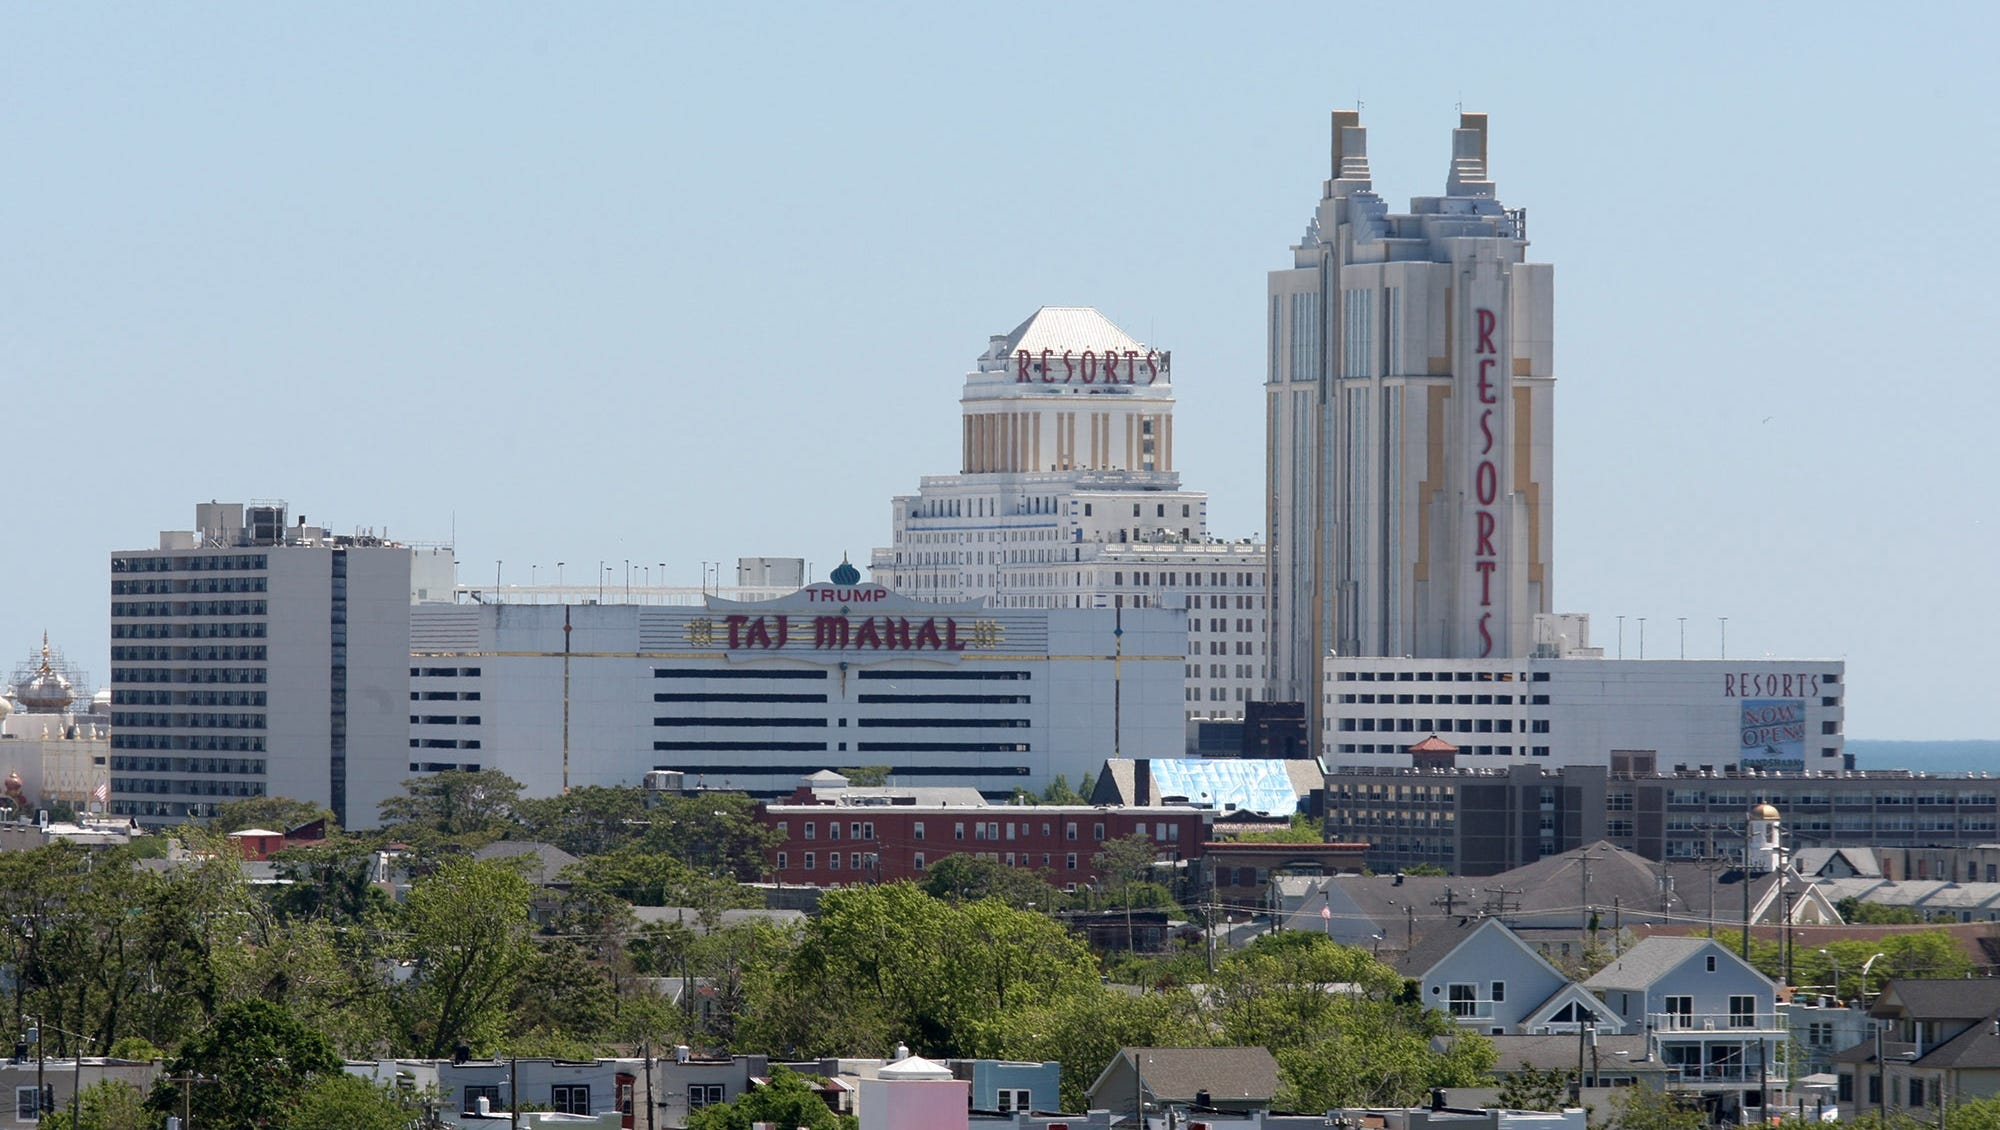 Atlantic city online gambling grand palais riverboat casino